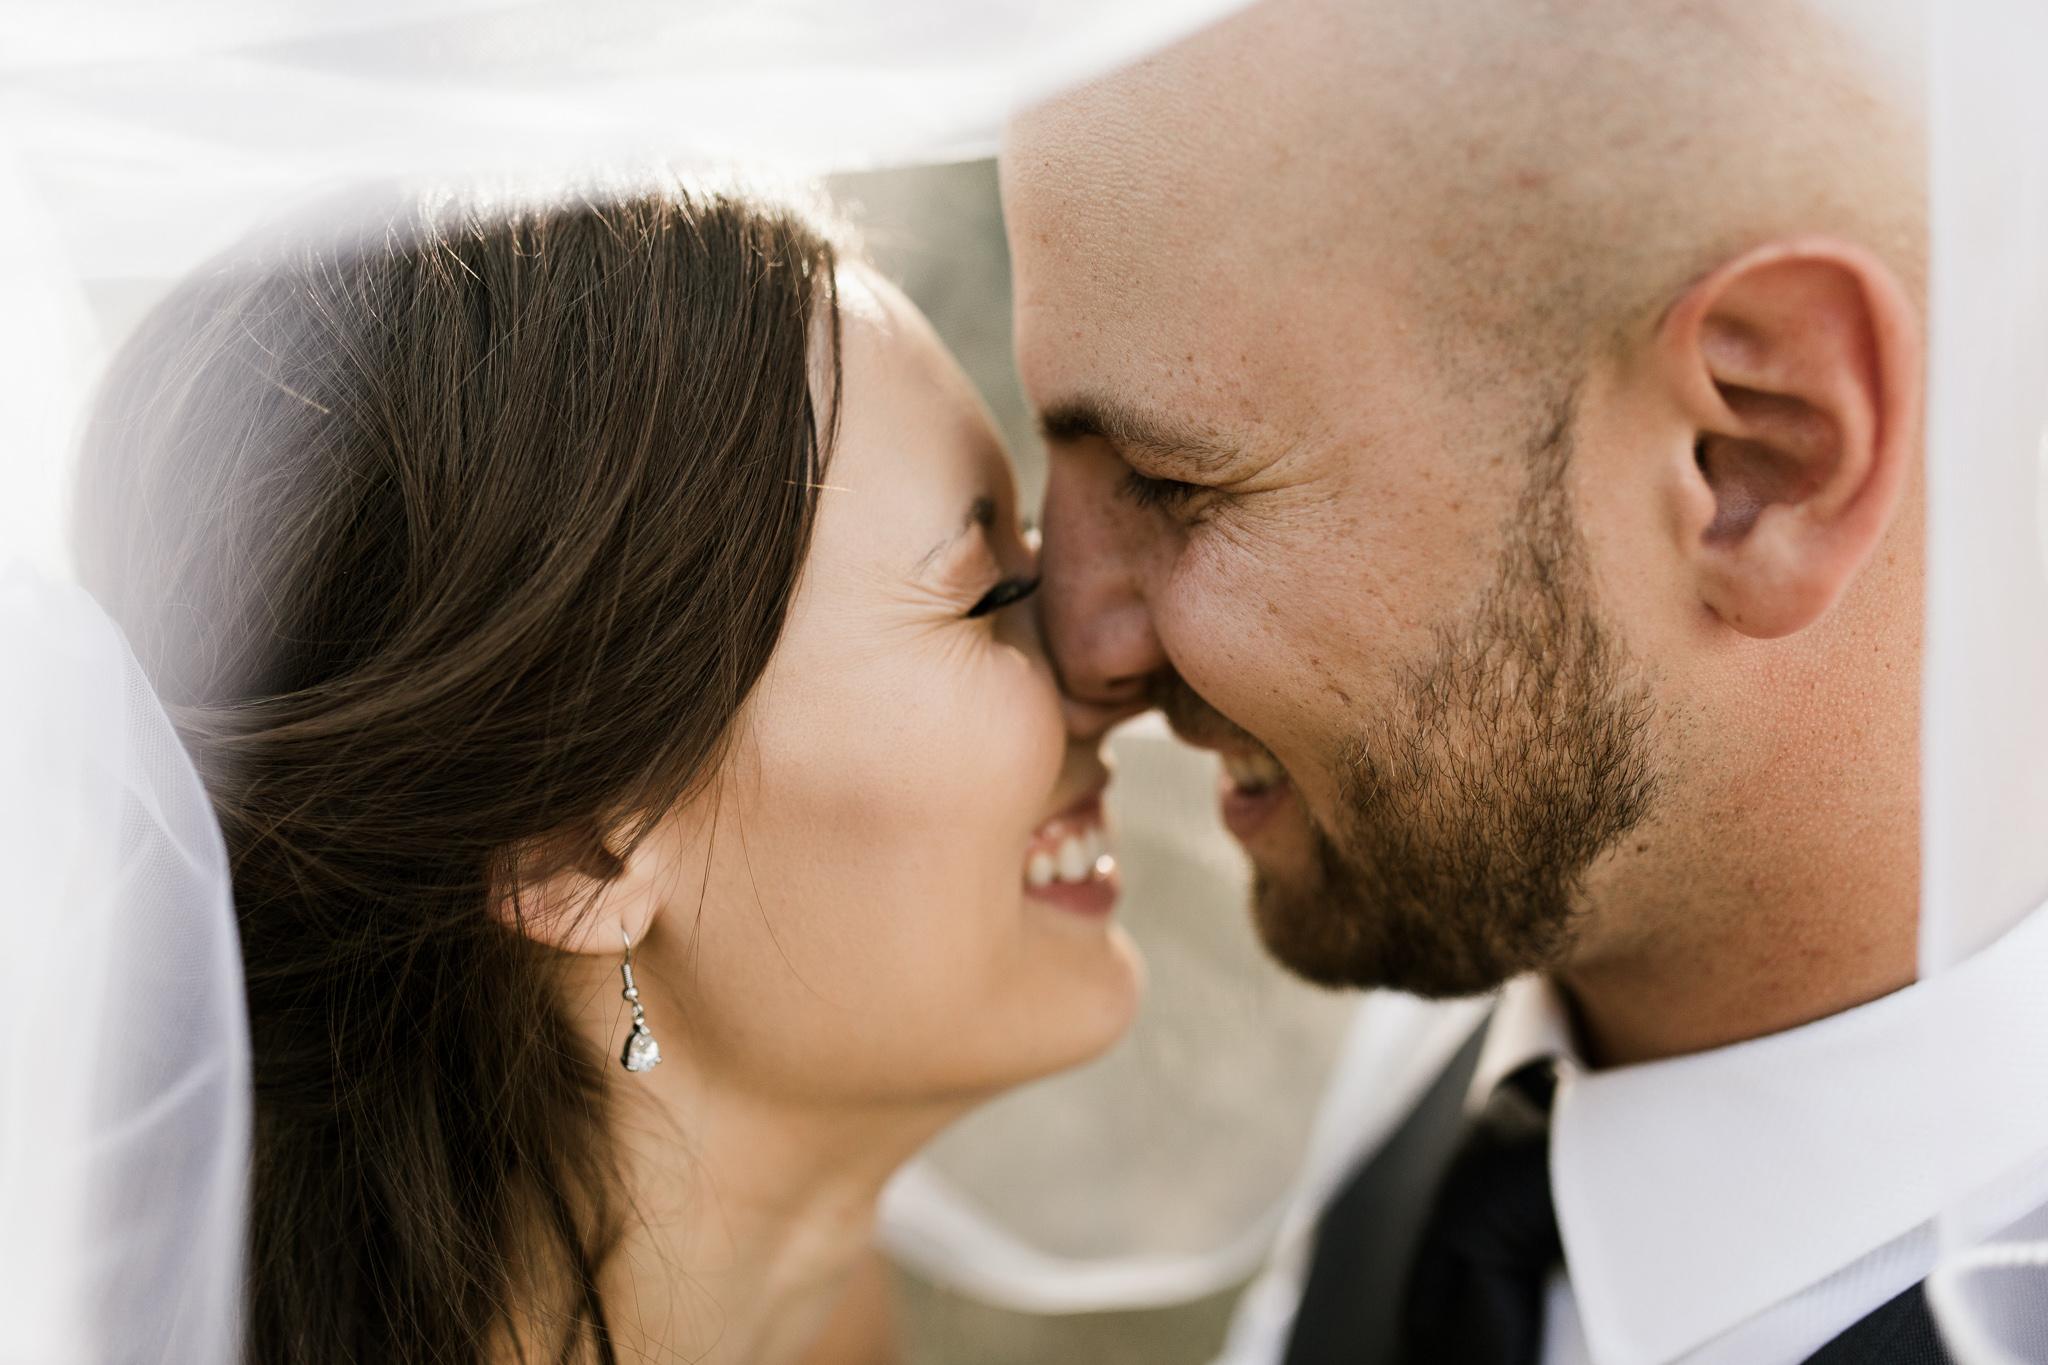 springer-house-burlington-wedding-photographer-450-of-756.jpg